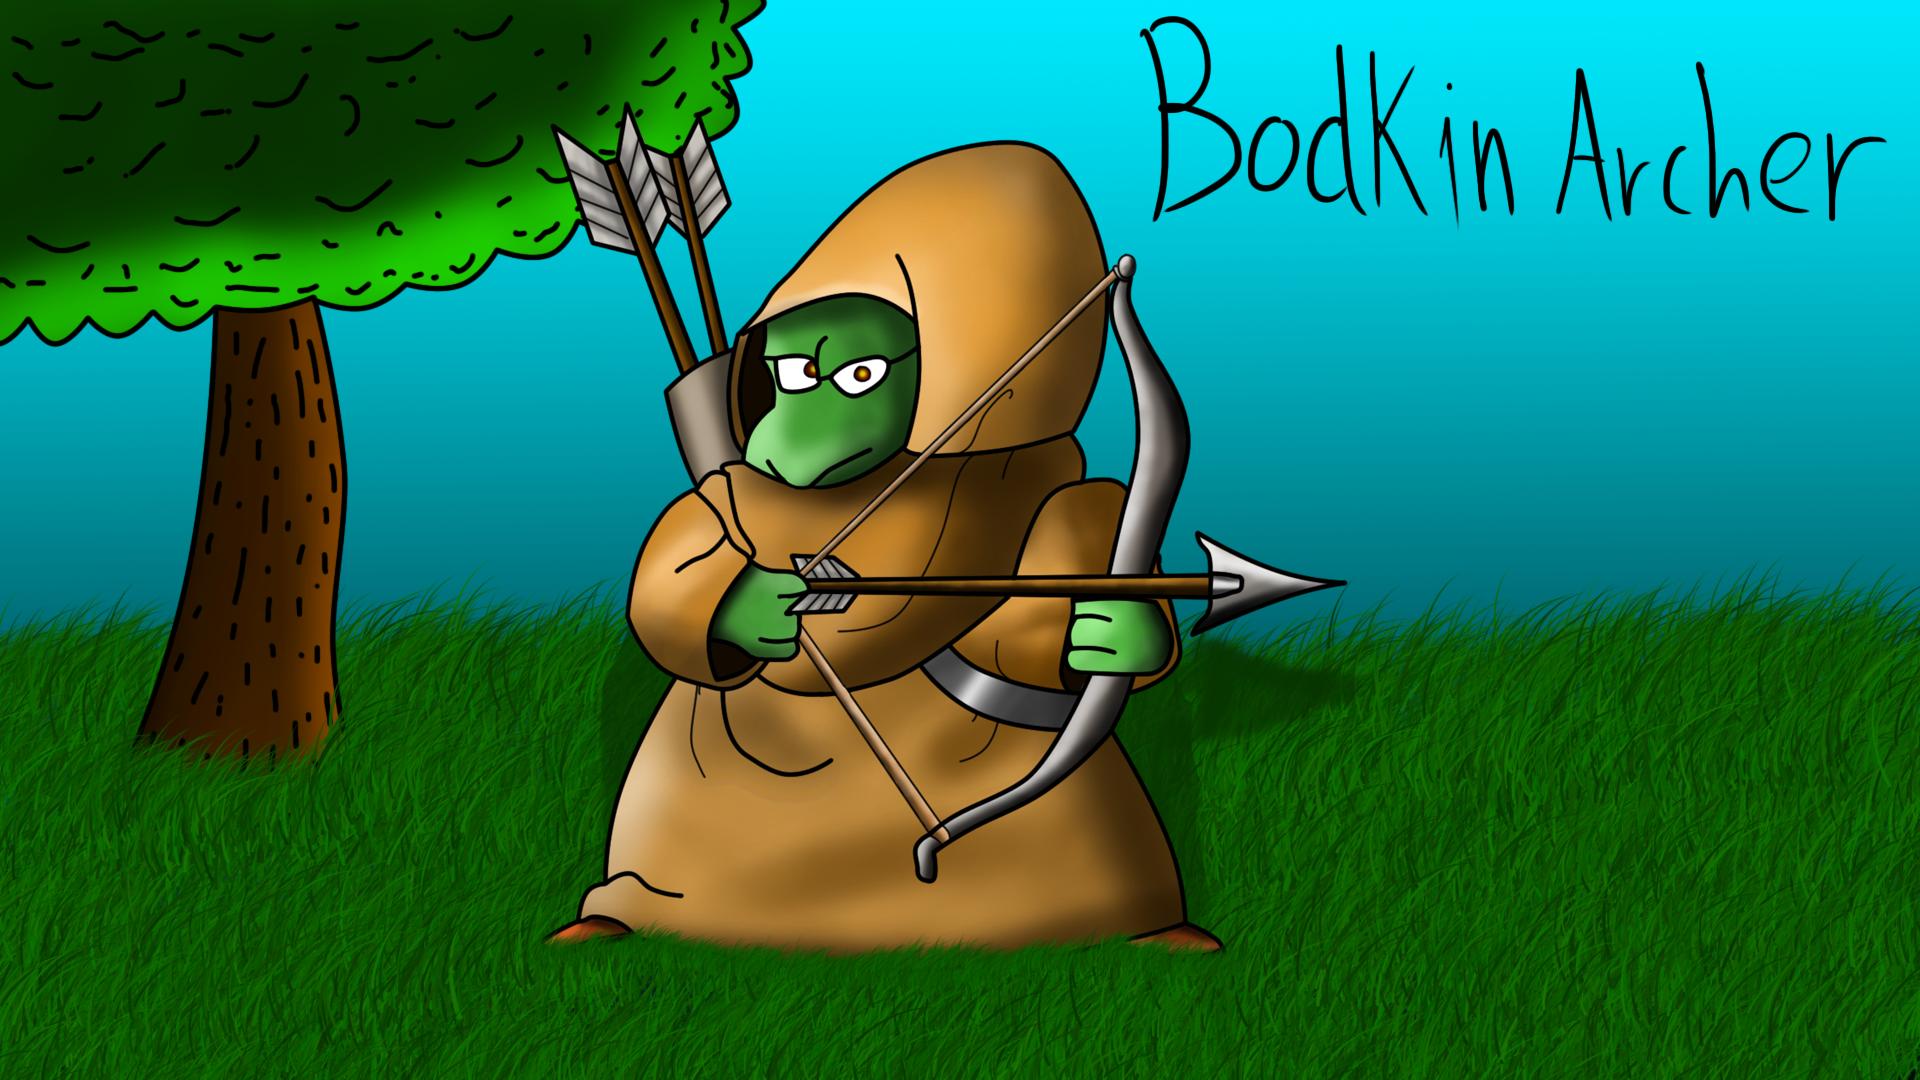 Bodkin Archer!